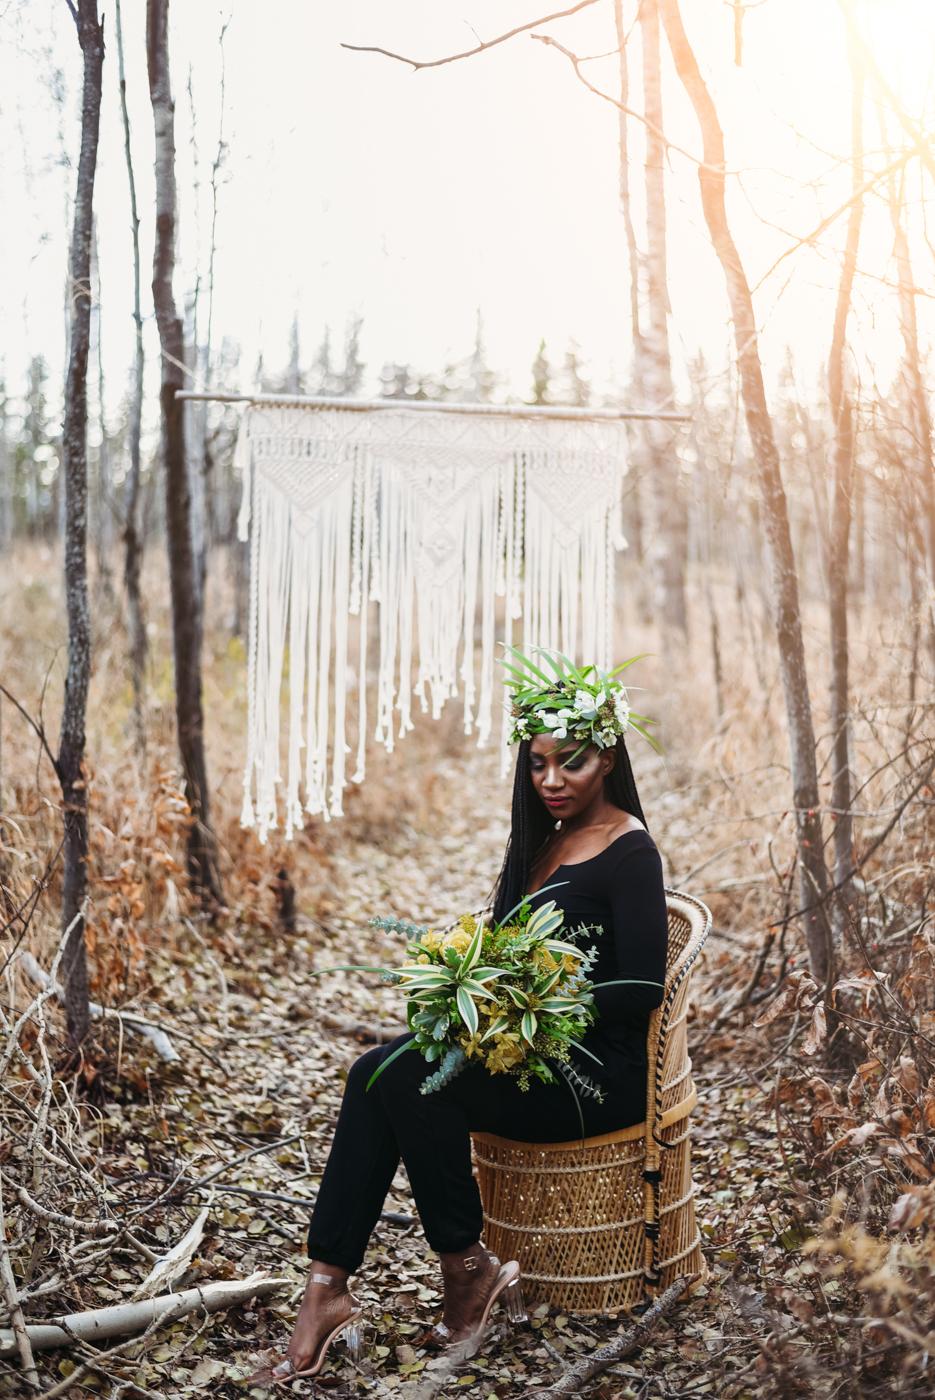 FortSt.John_photographer_TyraEPhotography_Wedding_Couple_Family_Photograhy_DawsonCreek_Elopement_Bride_Boduoir_Portraits-15.jpg